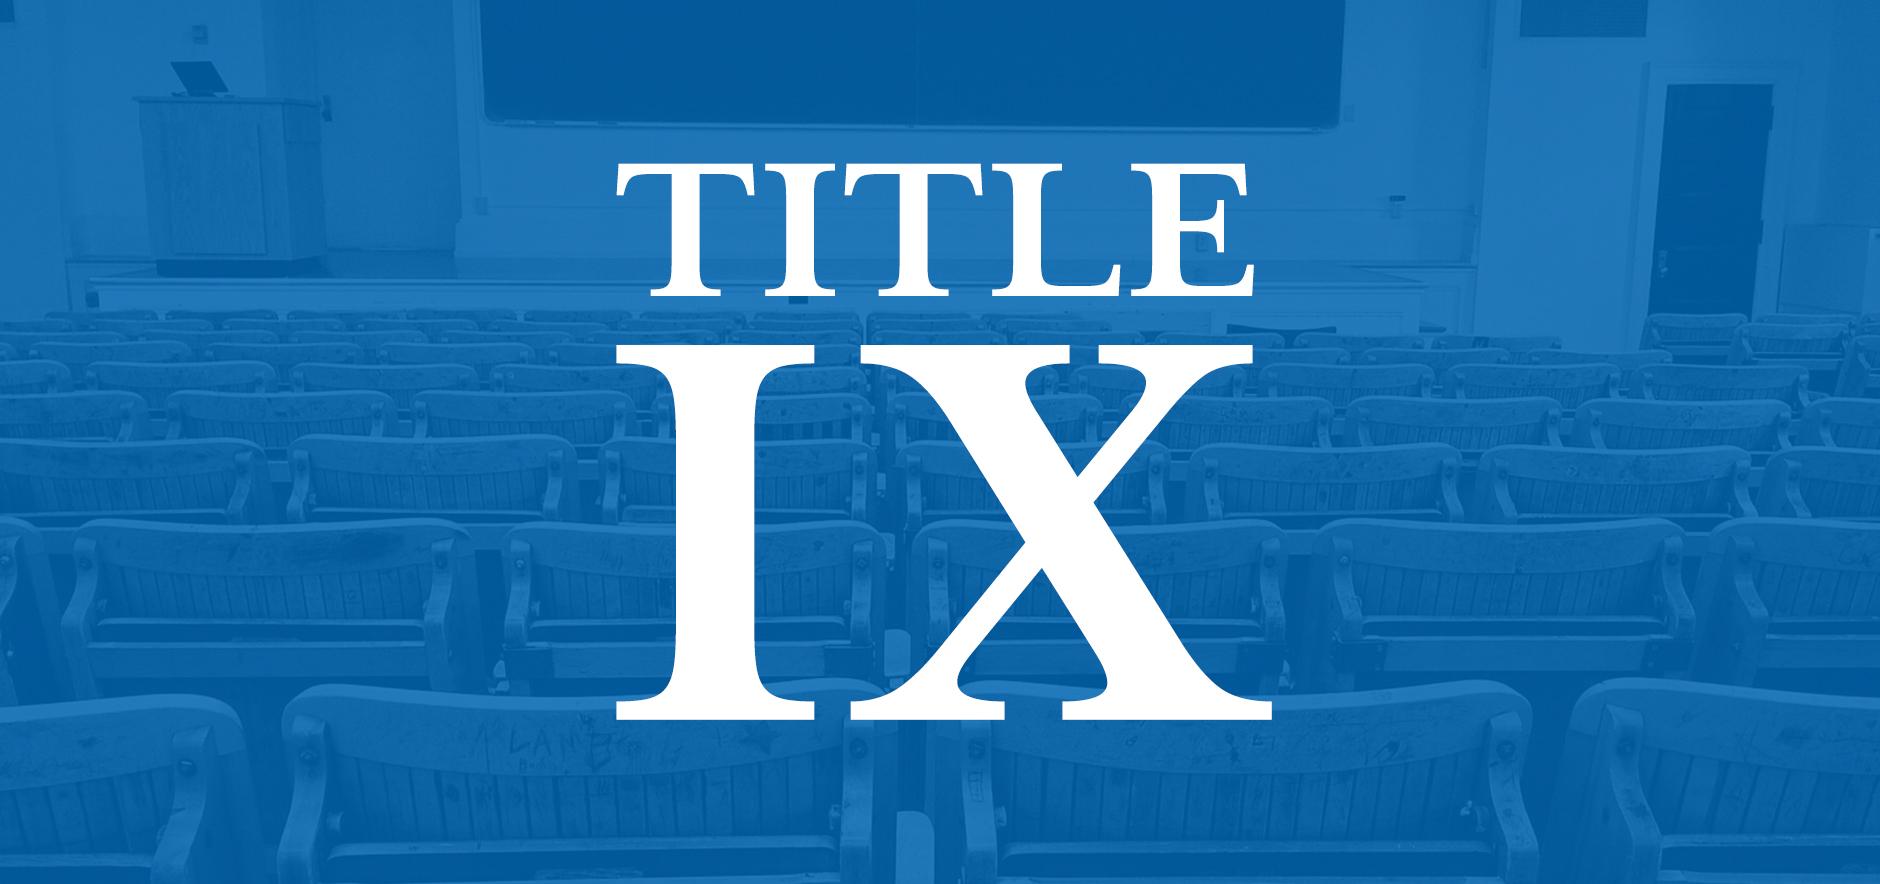 Title IX Violations